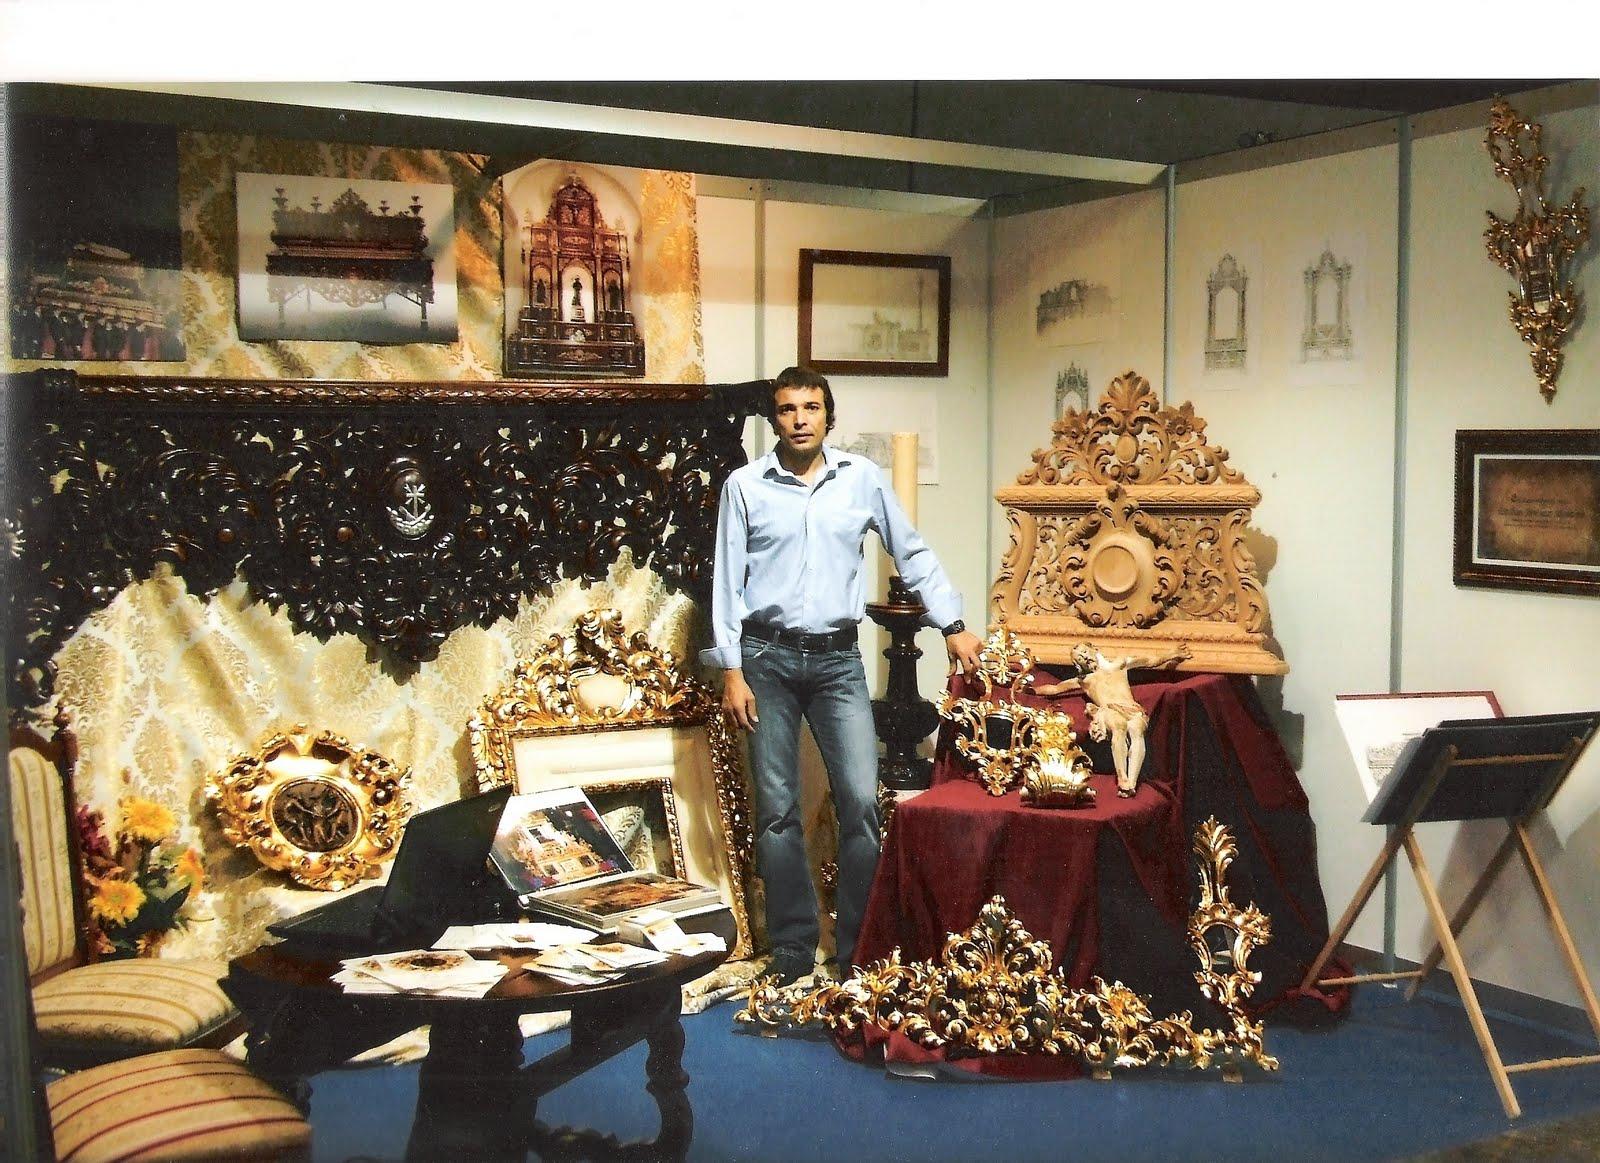 Hijos de esteban jimenez s l exposicion de arte sacro for Muebles jimenez baza